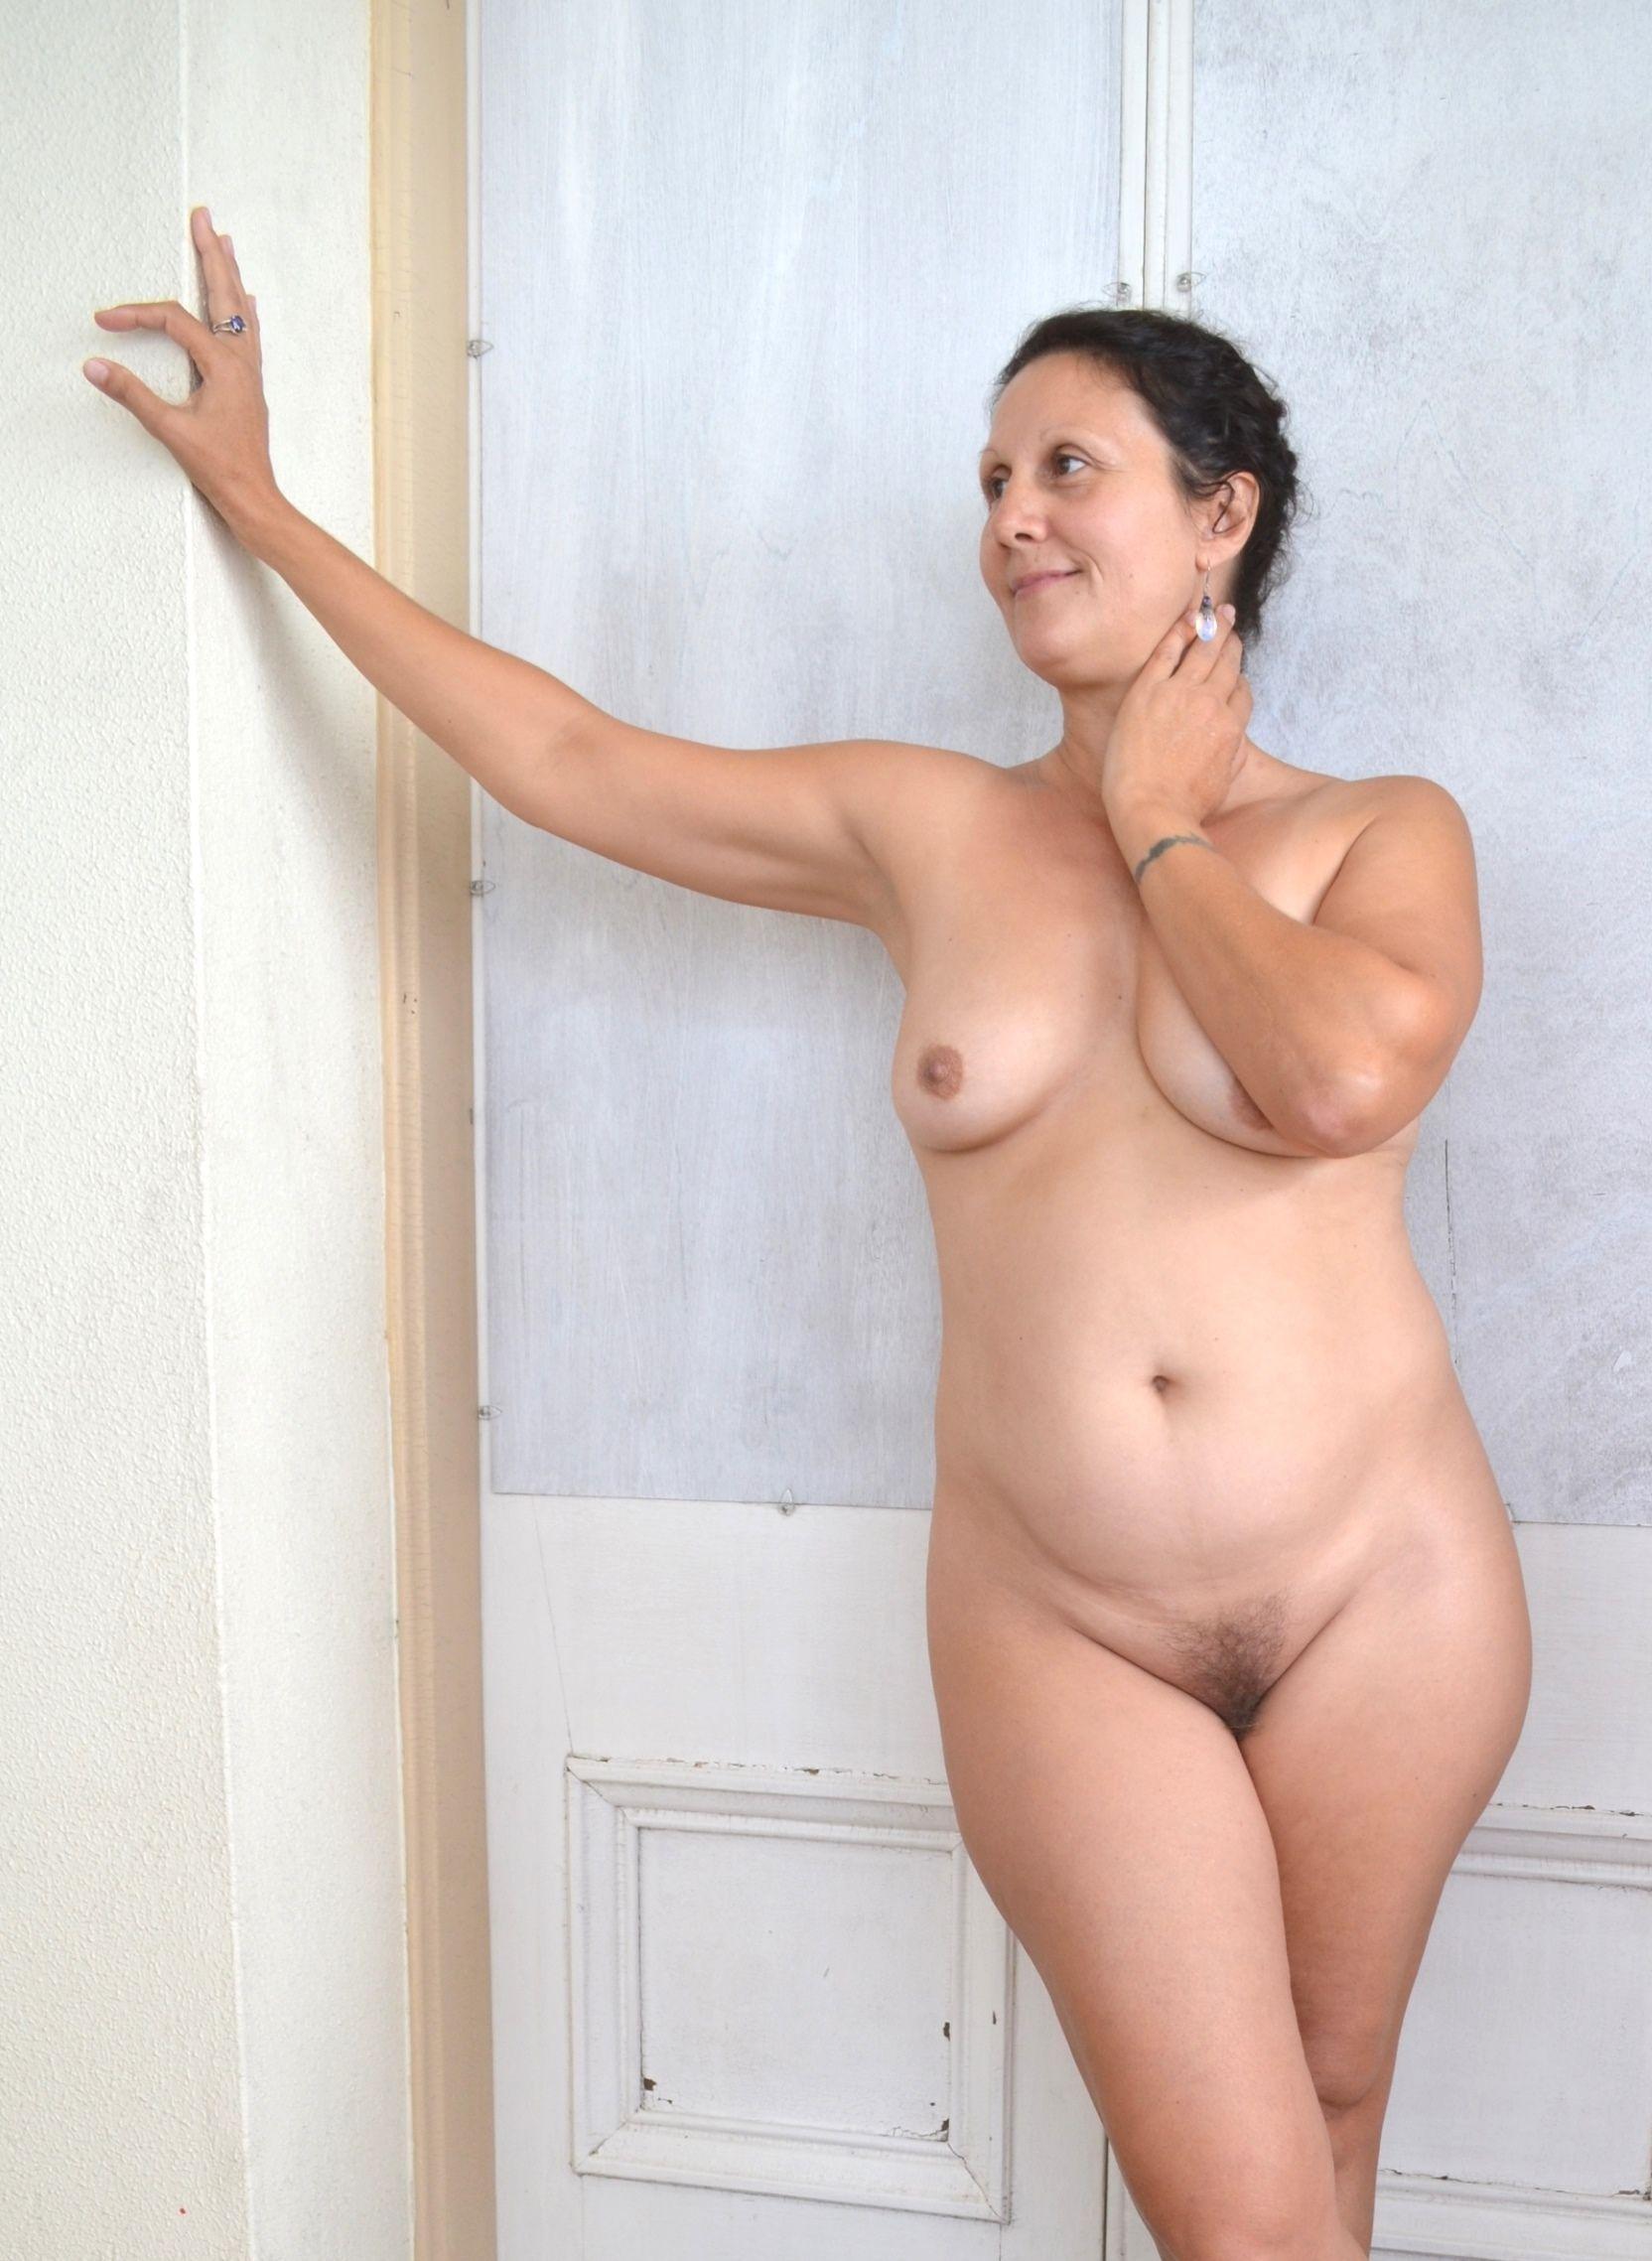 Can art mature nude where logic?